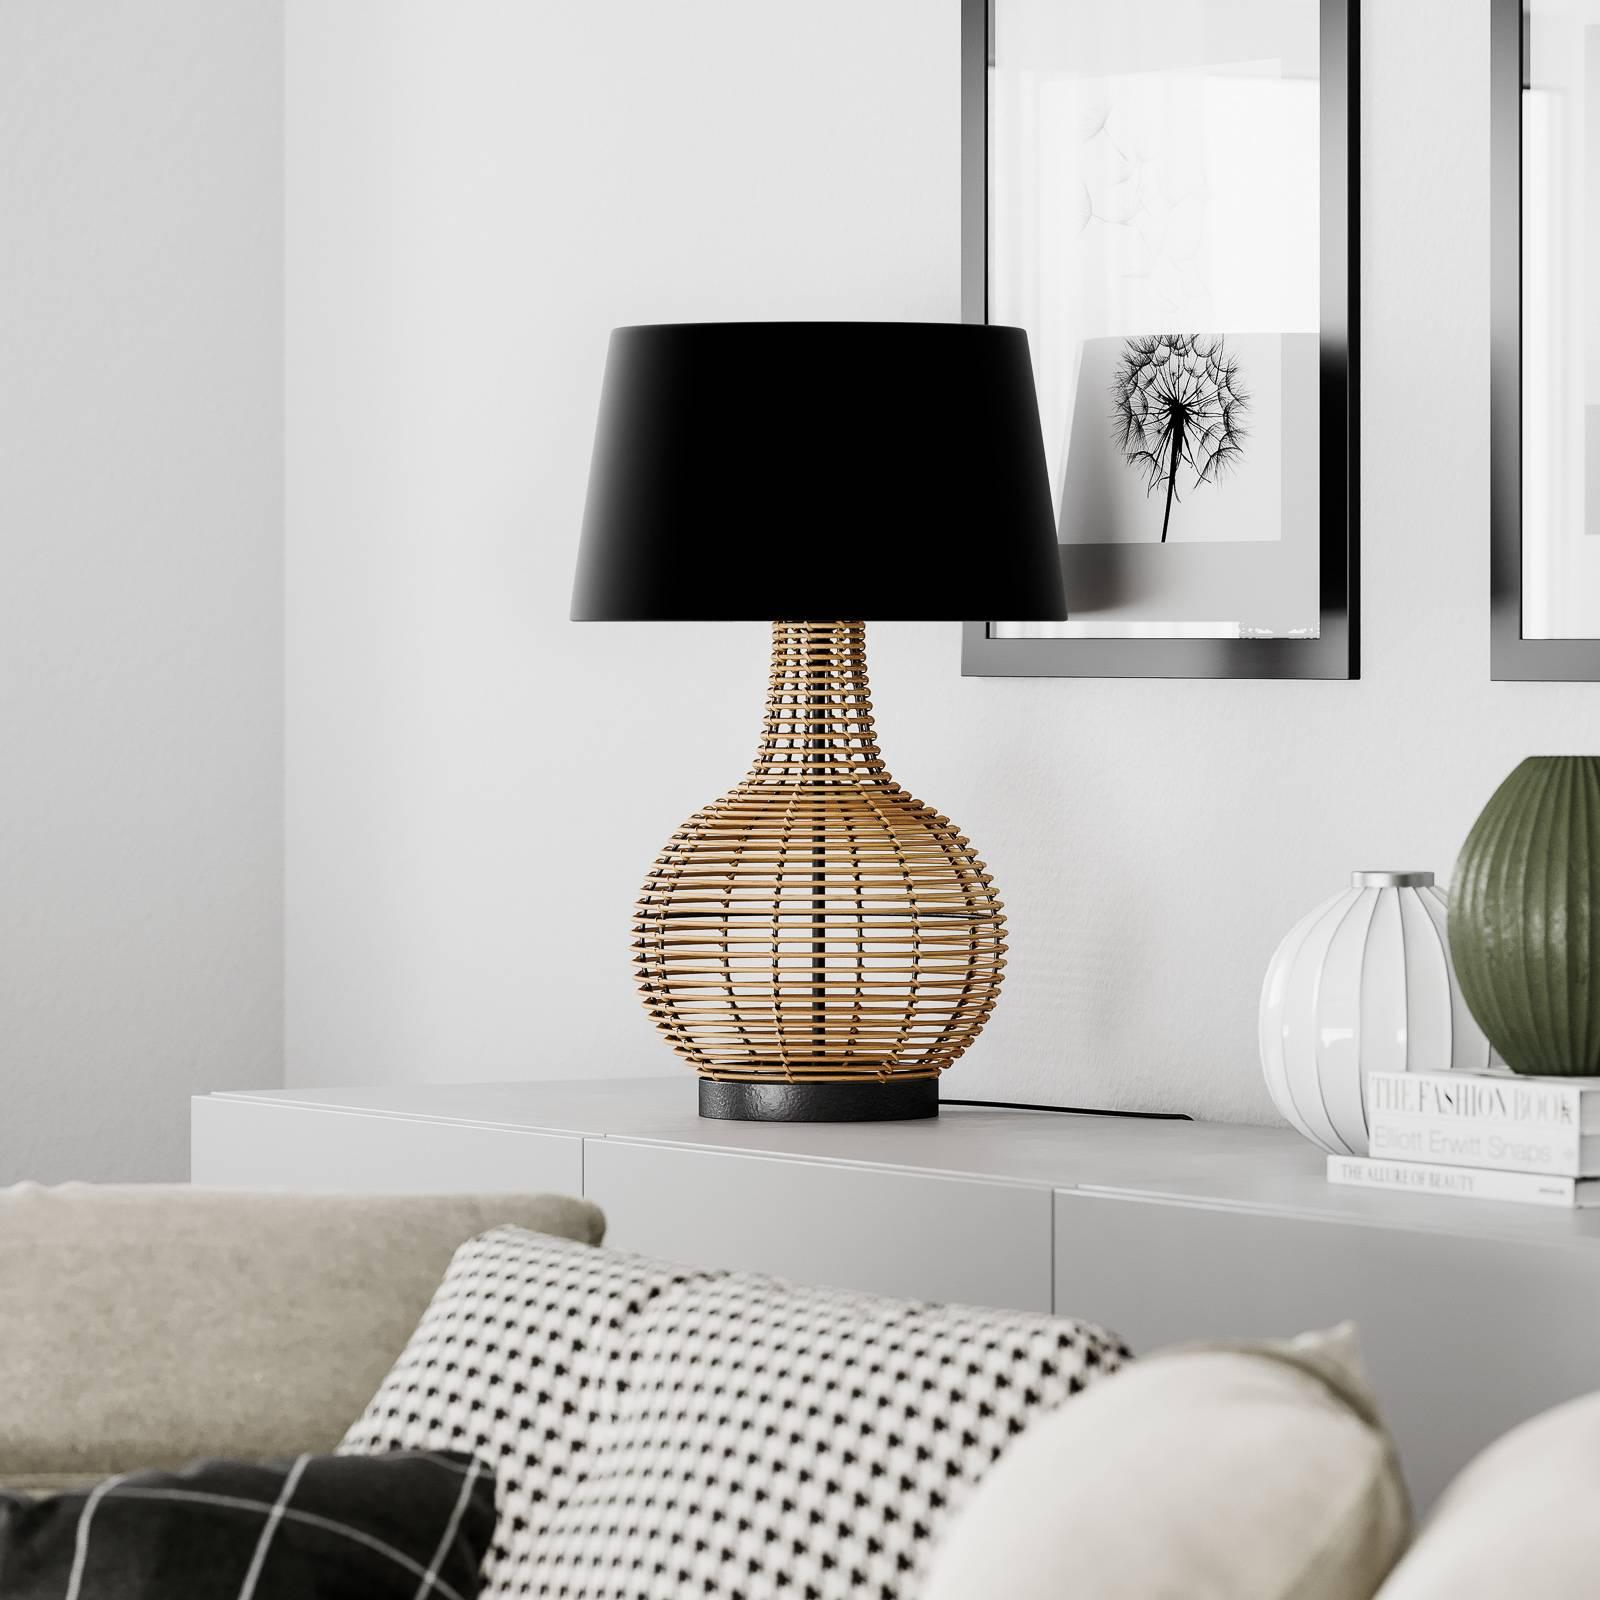 By Rydéns Granada pöytälamppu, rottinki ja kangas